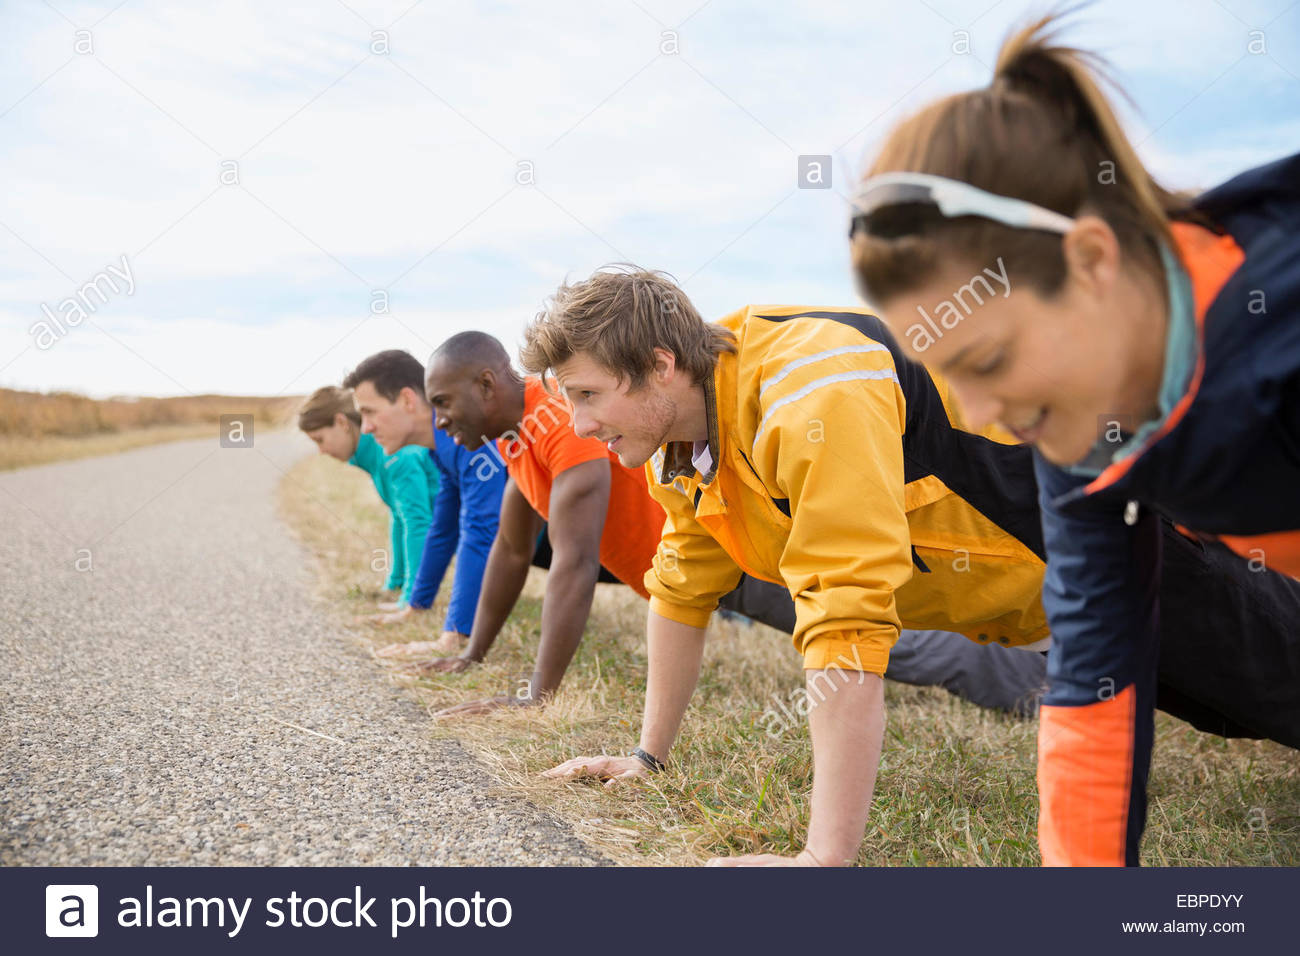 Gruppo facendo push-up in una riga Immagini Stock